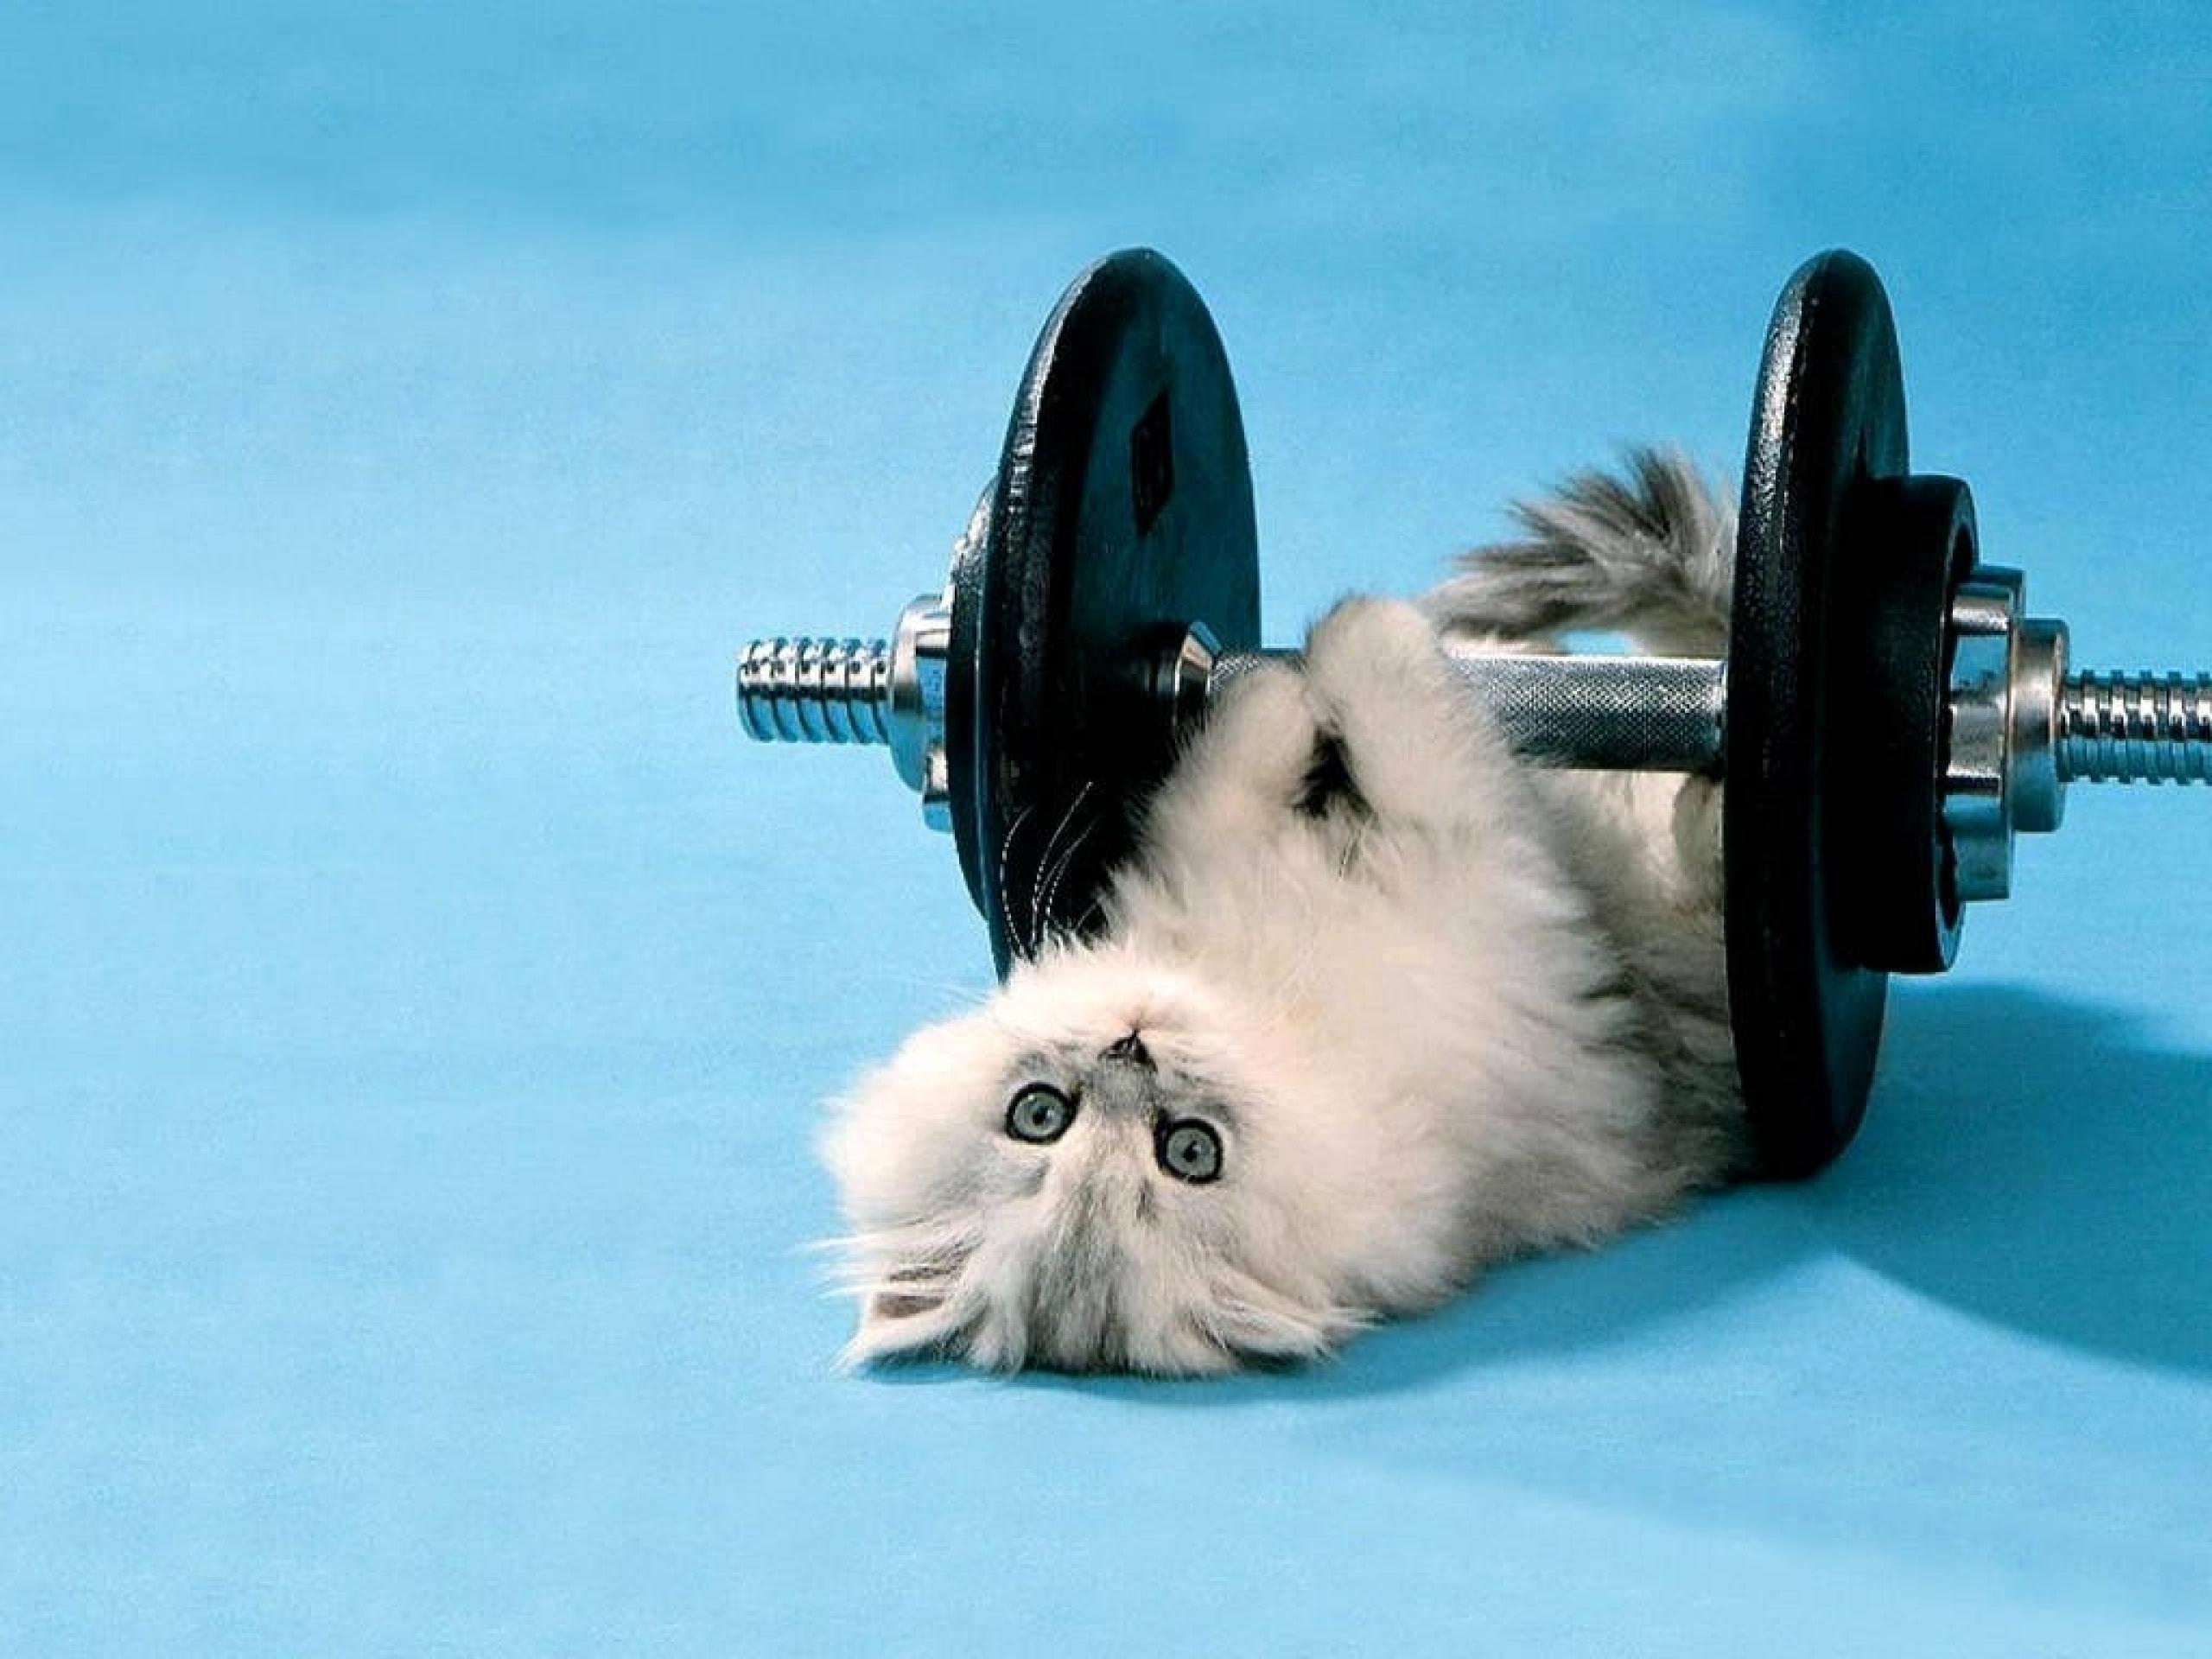 funny kitten lifting weights wallpaper thumb